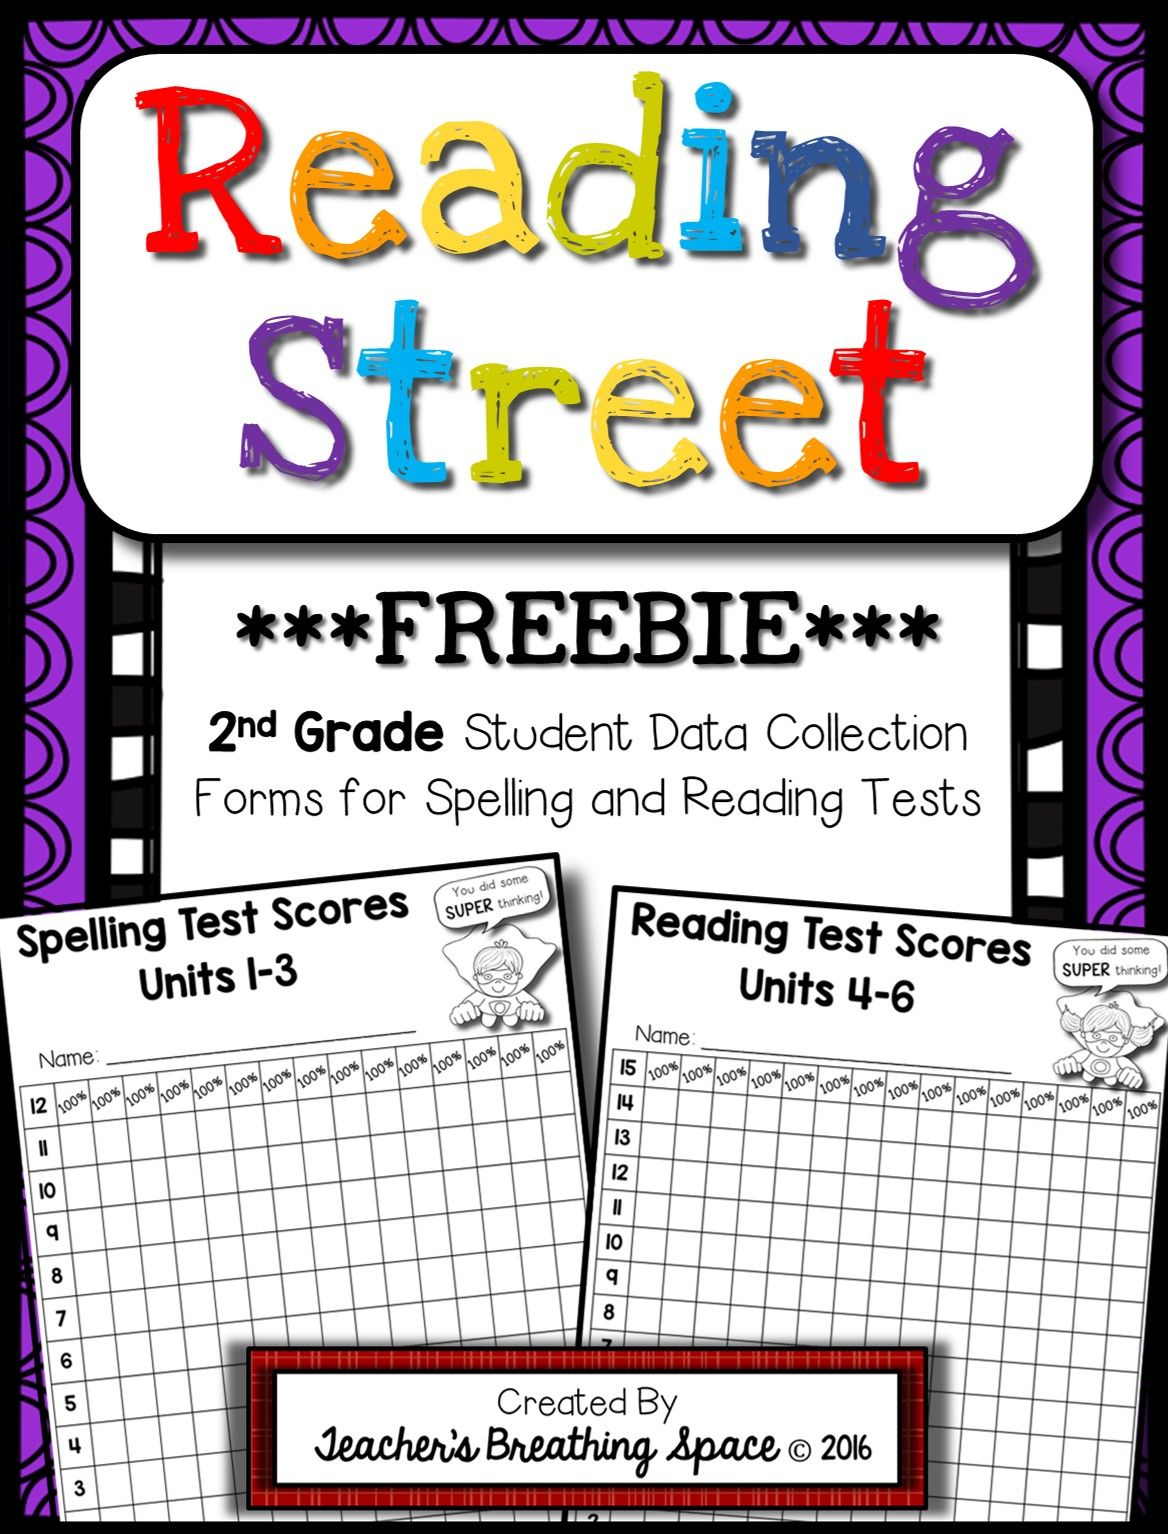 6th Fluency Passage 10 Jpg 1024 1440 Reading Worksheets Fluency Passages Reading Com In 2021 Reading Comprehension Worksheets Fluency Passages Reading Fluency Passages